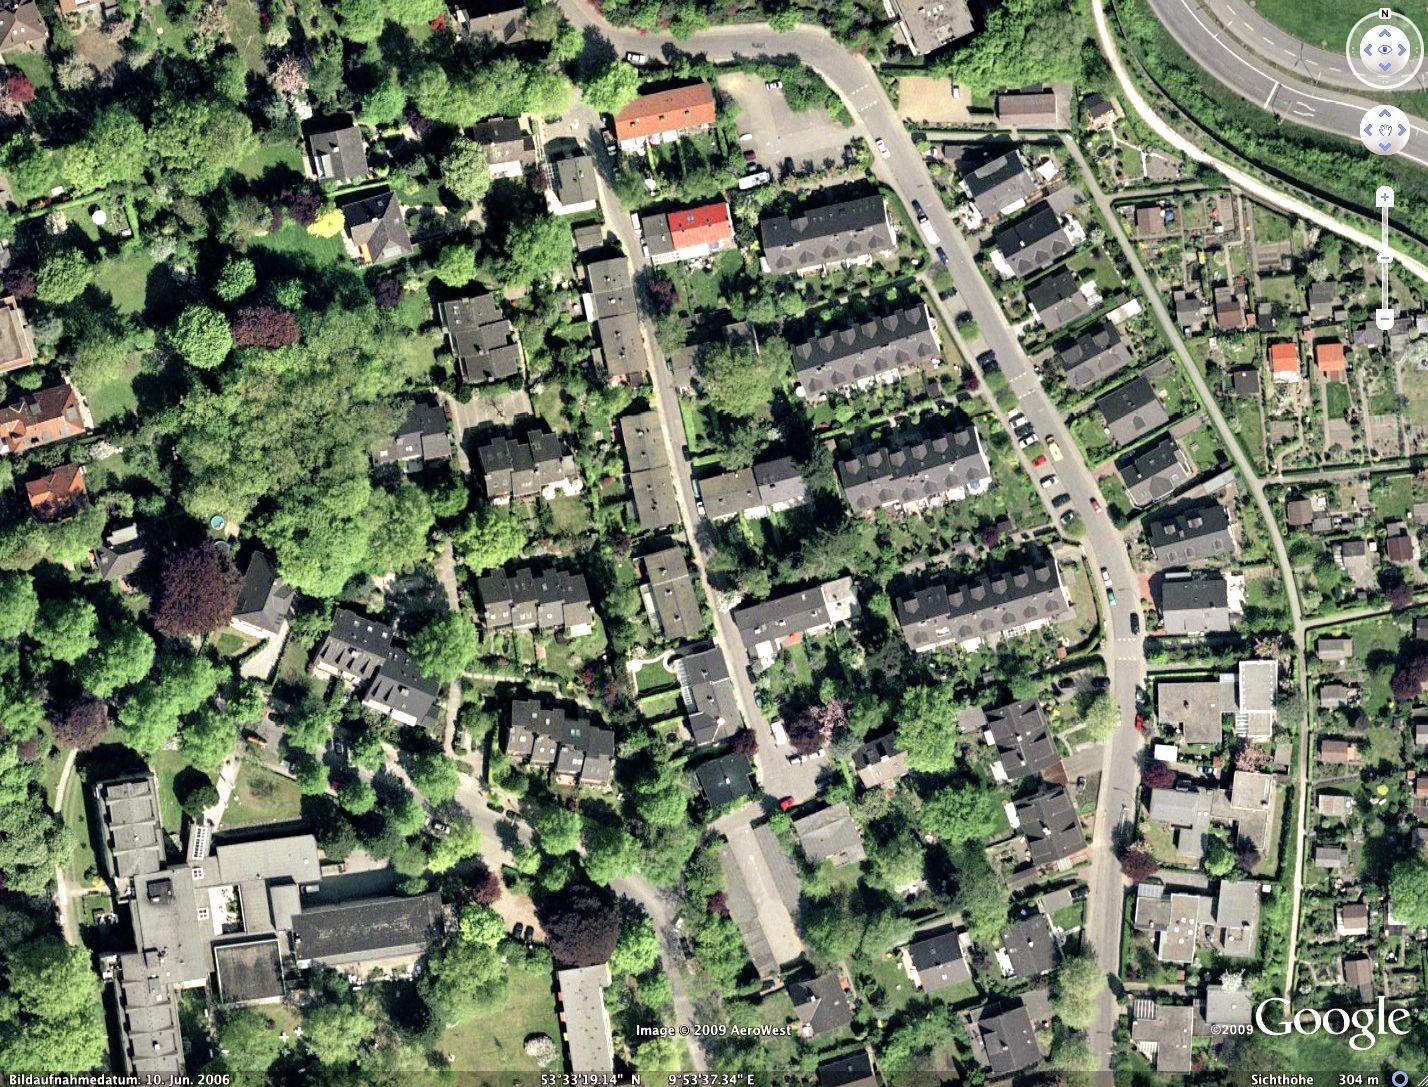 Google Earth - Luftbild Hamburg